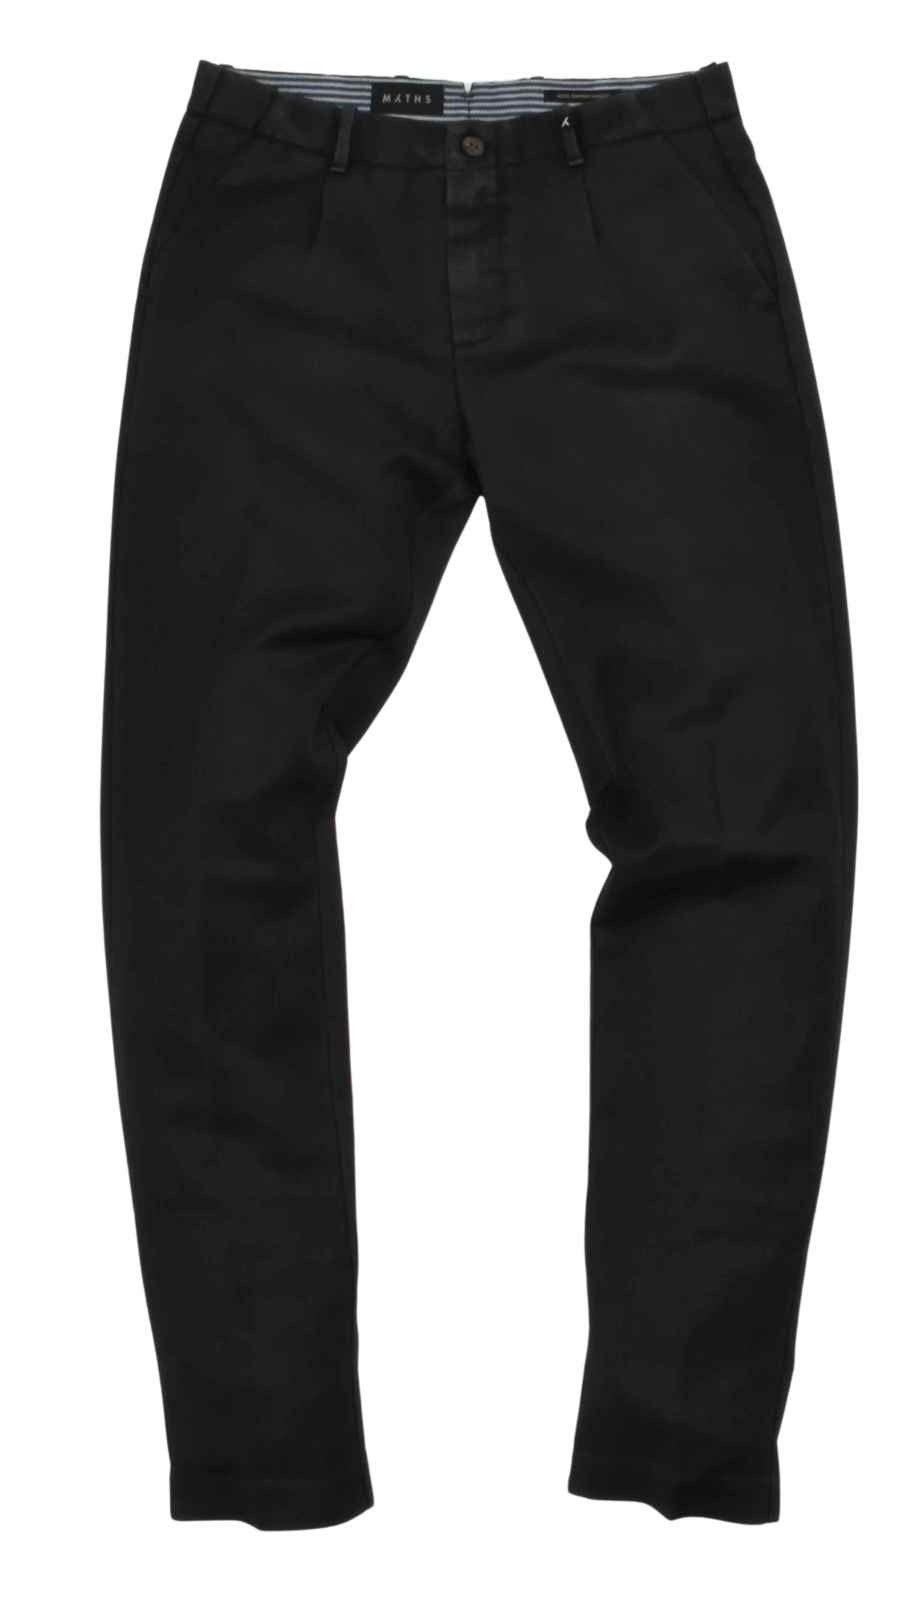 MYTHS - Herren Hose - Pantalone Lungo - Faded Black